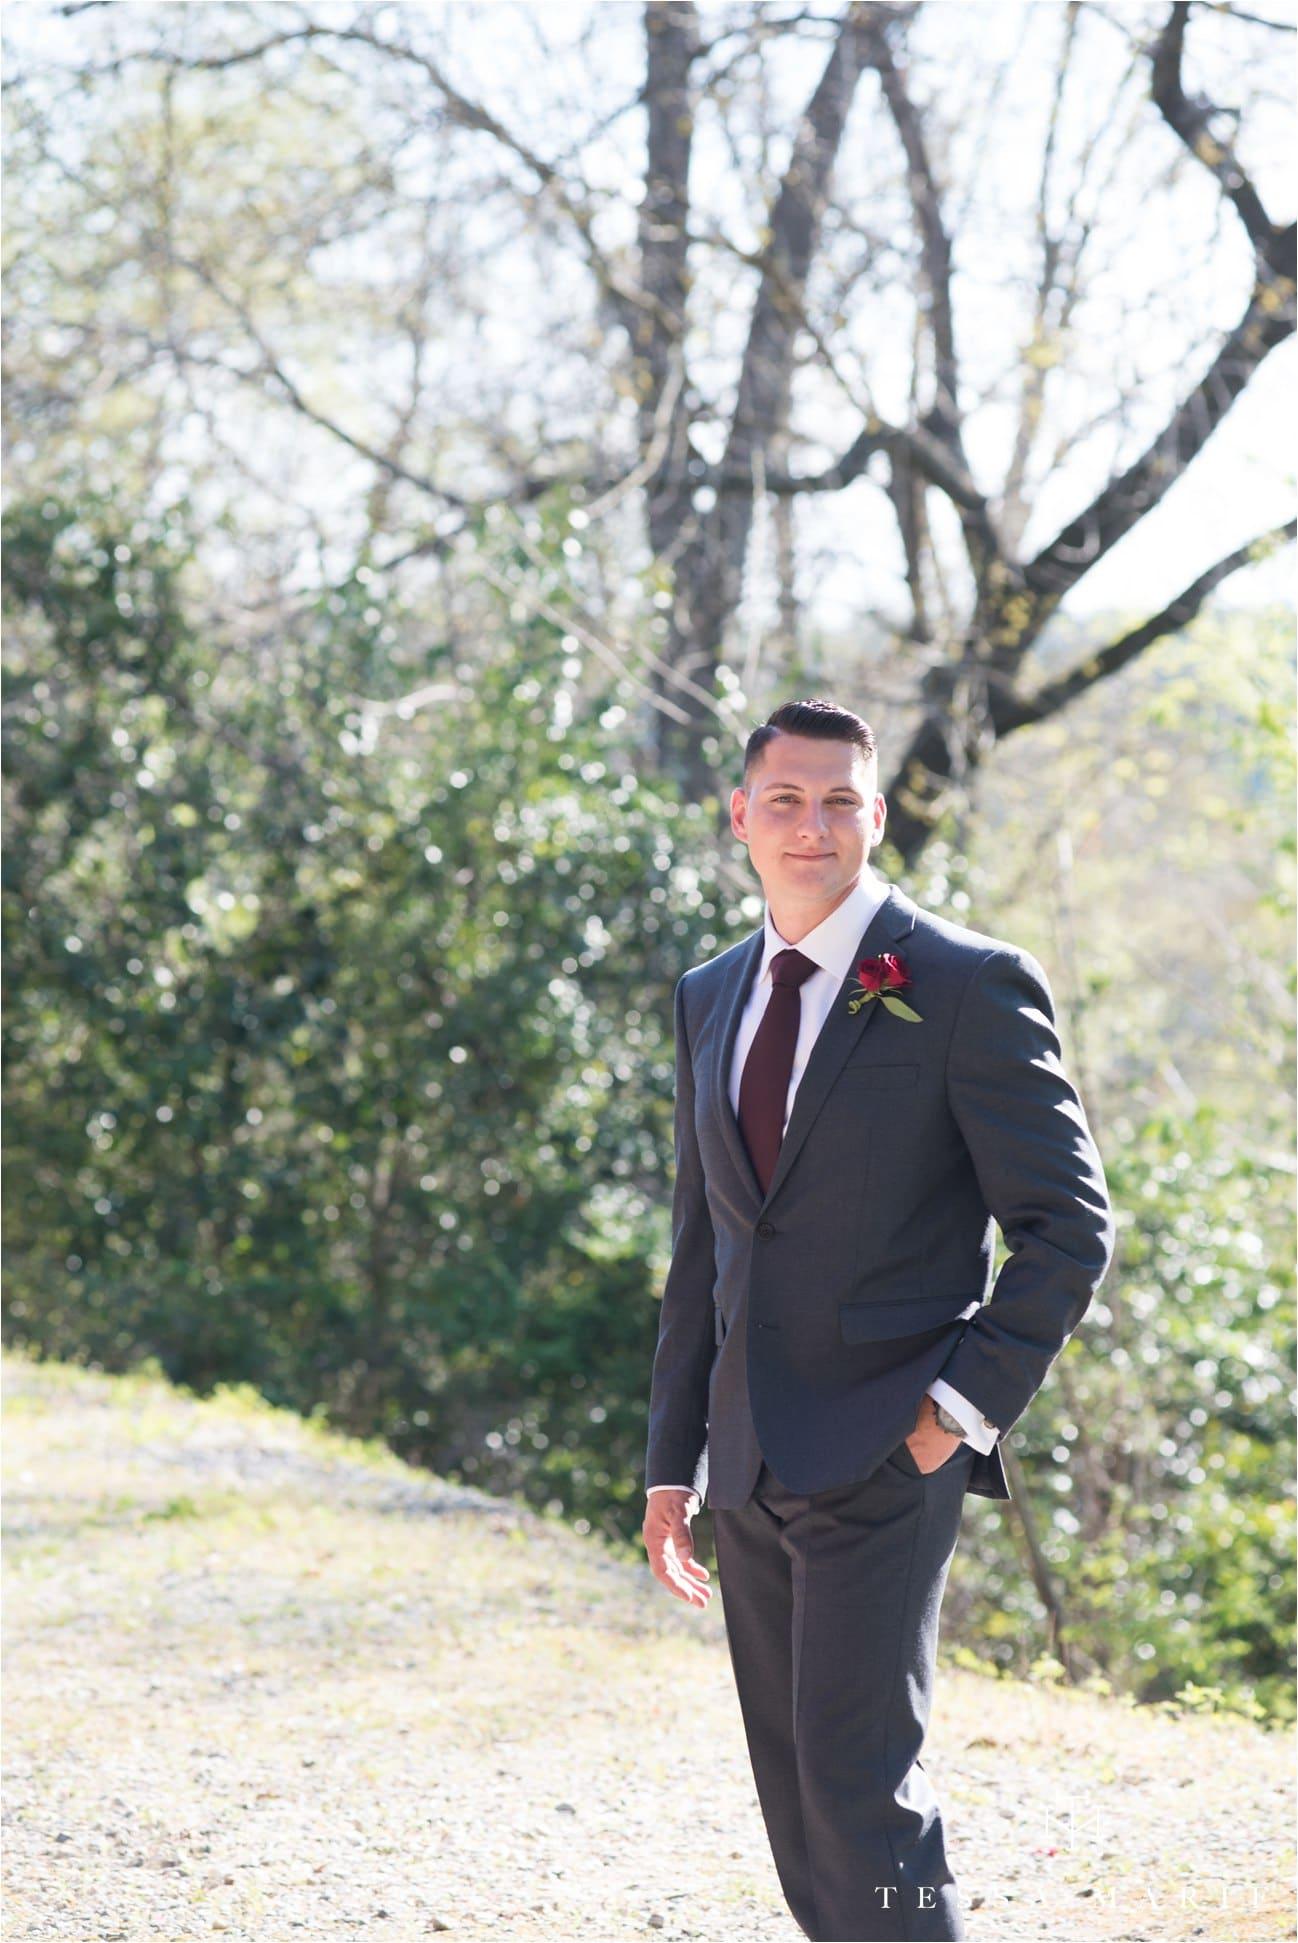 tessa_marie_weddings_rivermill_event_centere_candid_outdoor_wedding_photos_0143